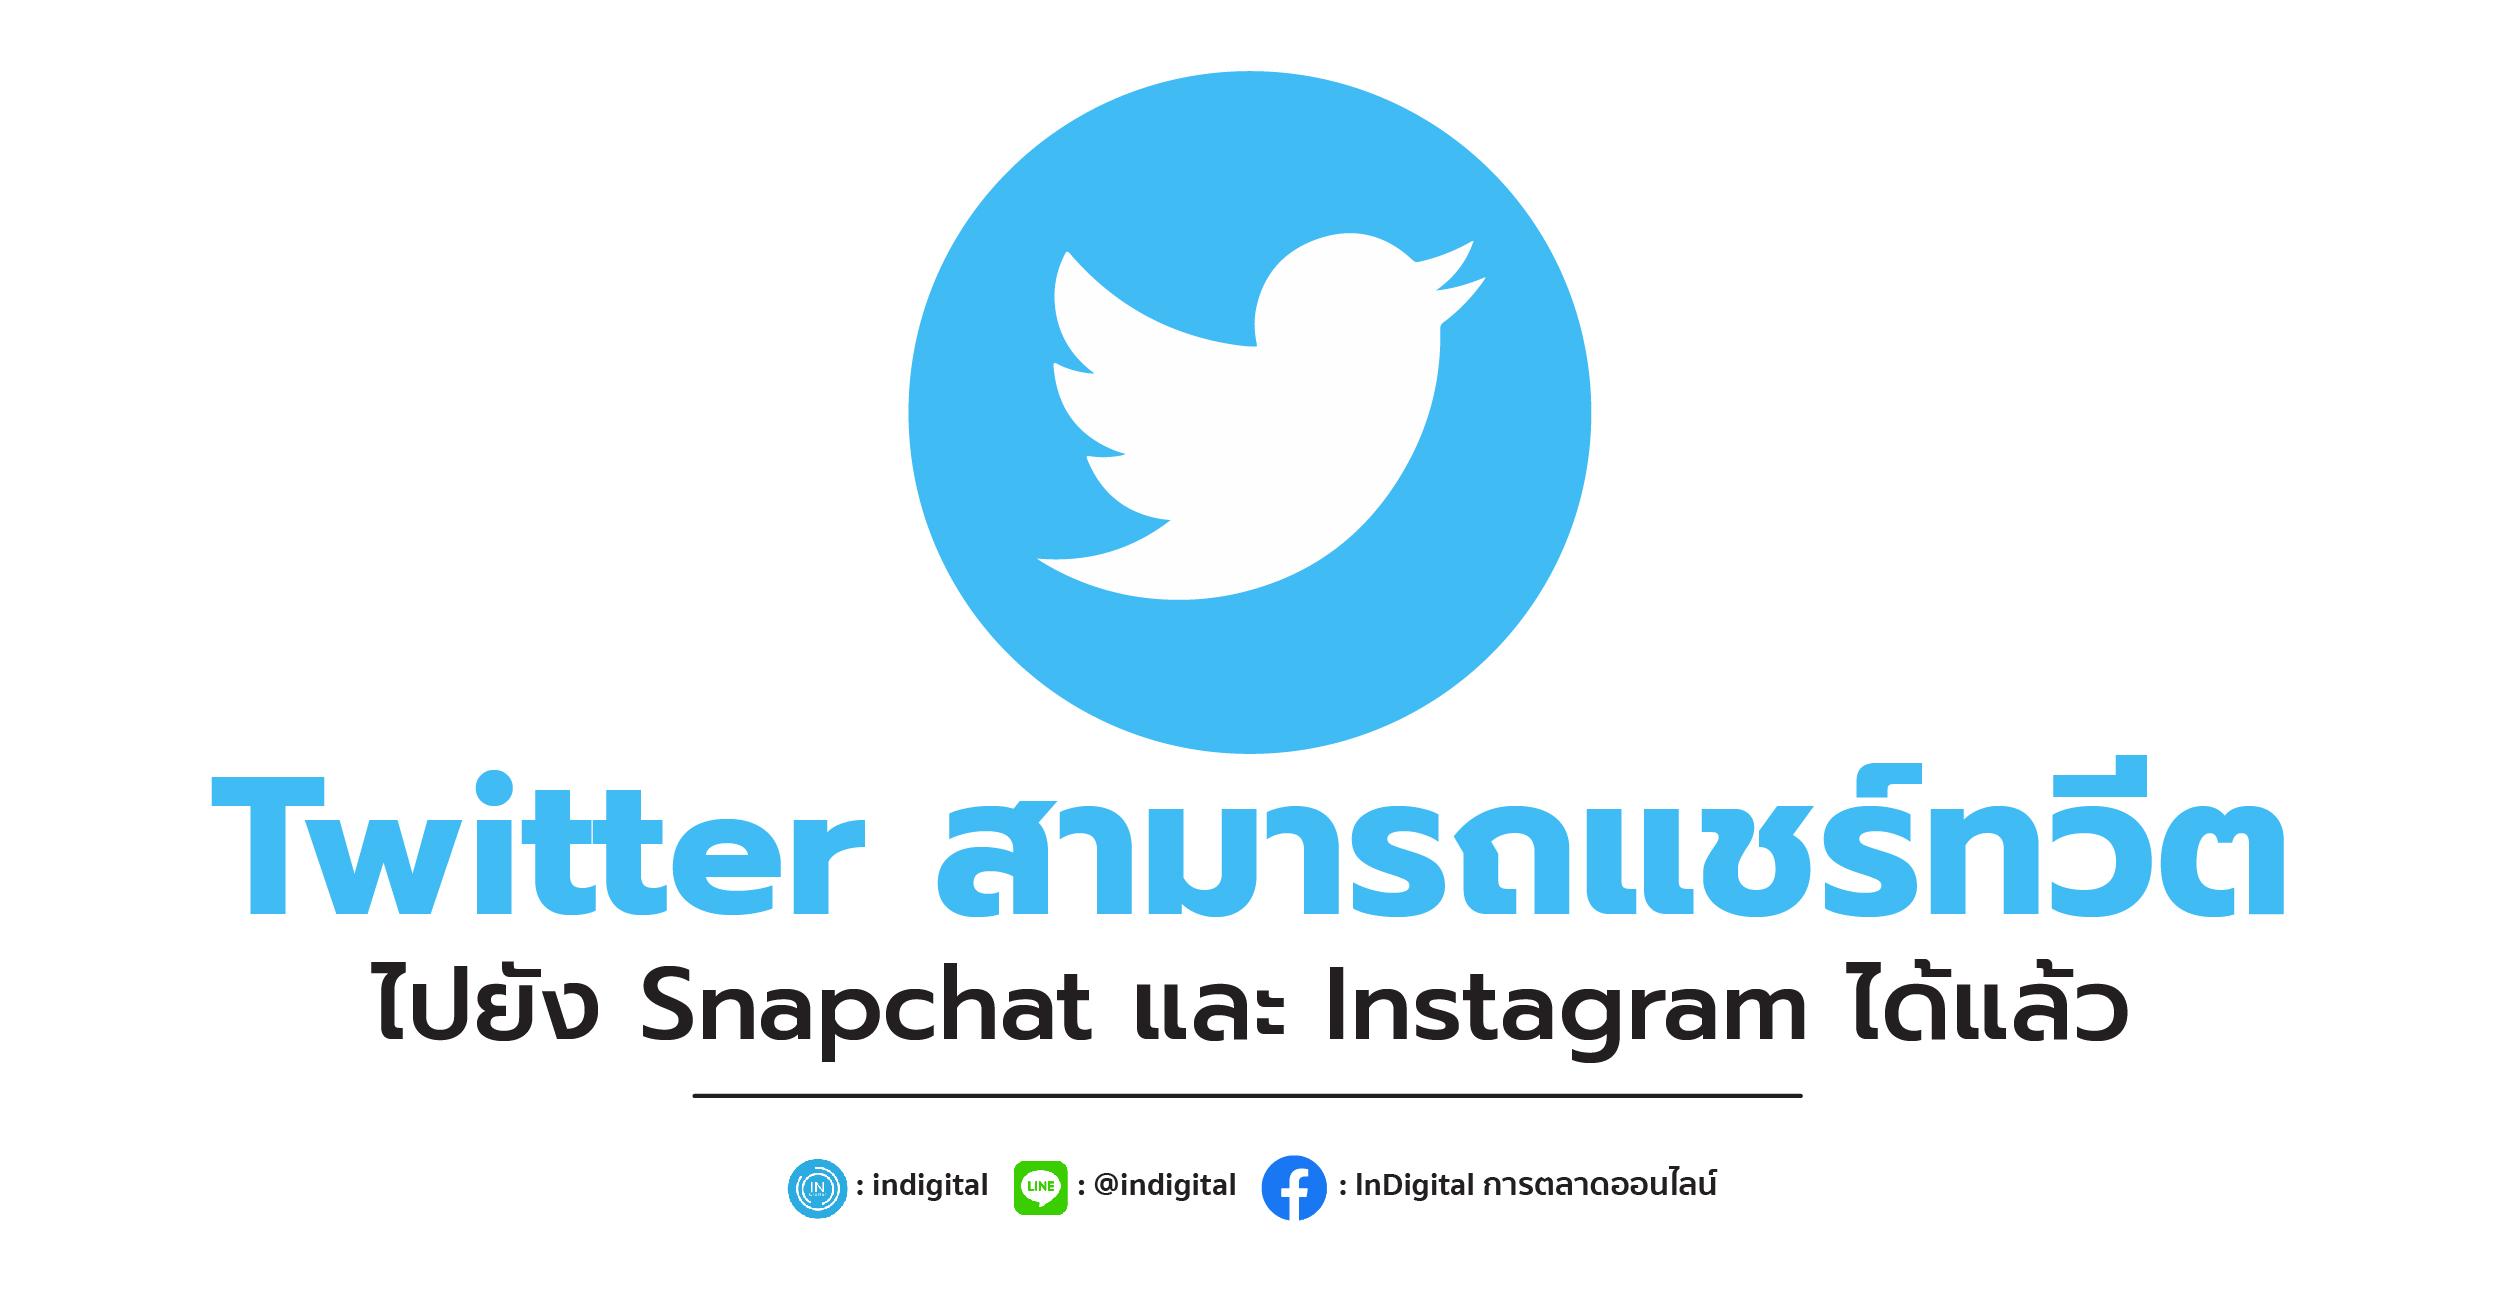 Twitter สามารถแชร์ทวีตไปยัง Snapchat และ Instagram ได้แล้ว